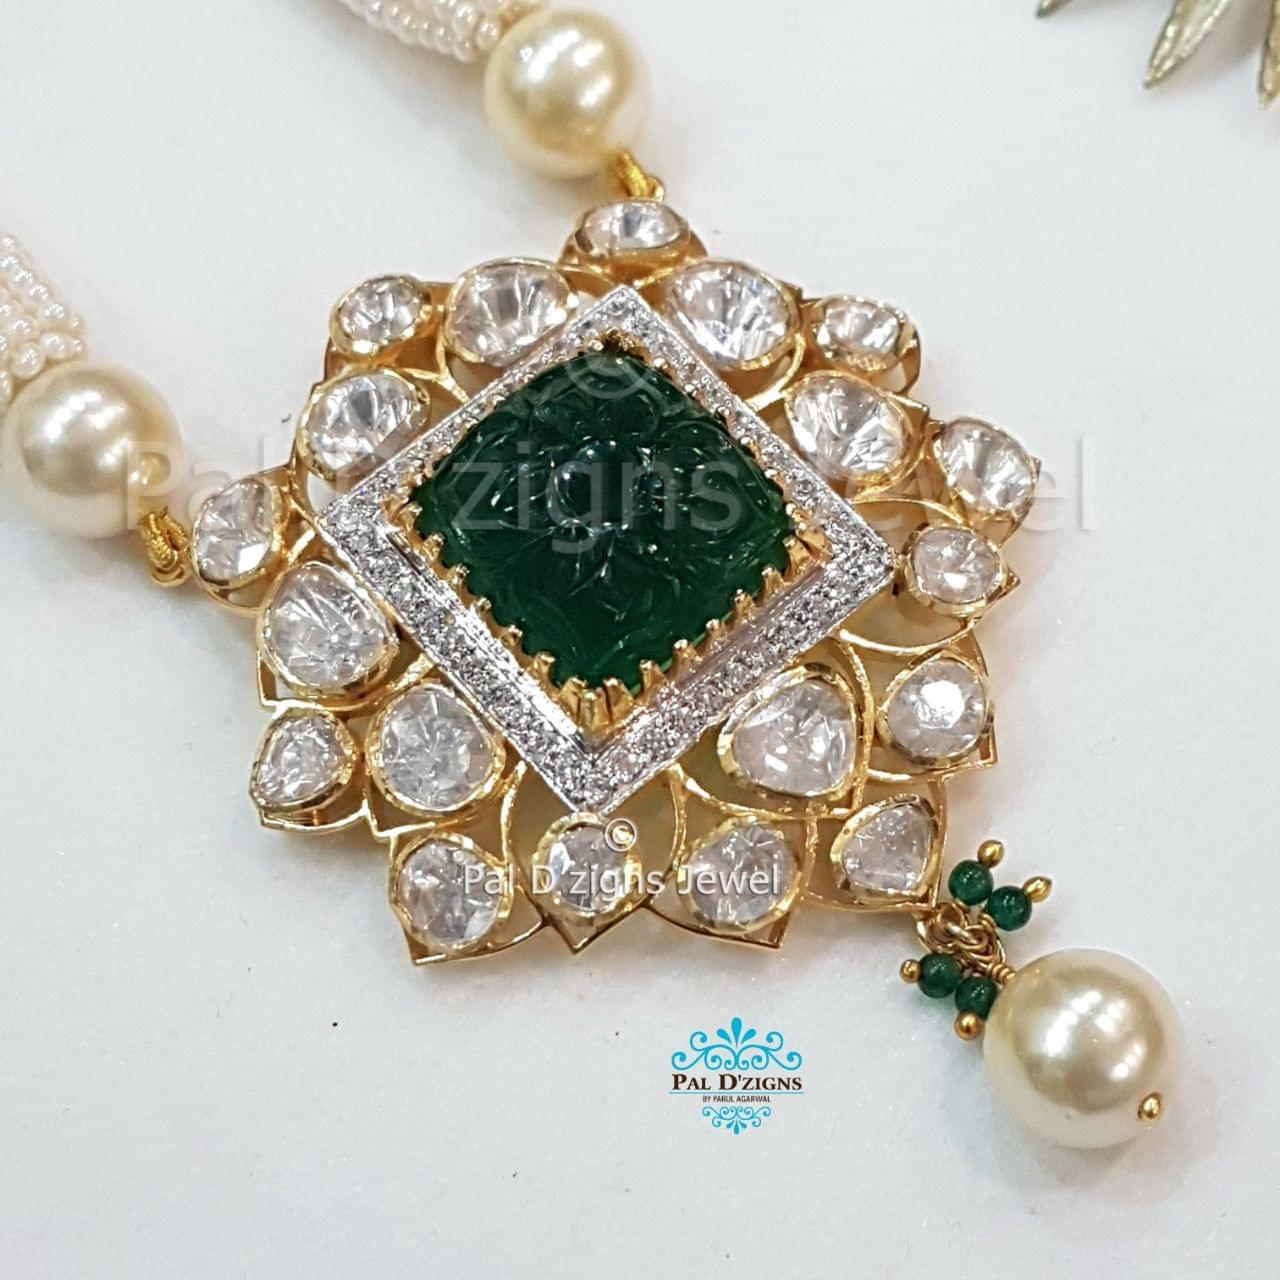 Astro Emerald Moissanite Polki Pendant